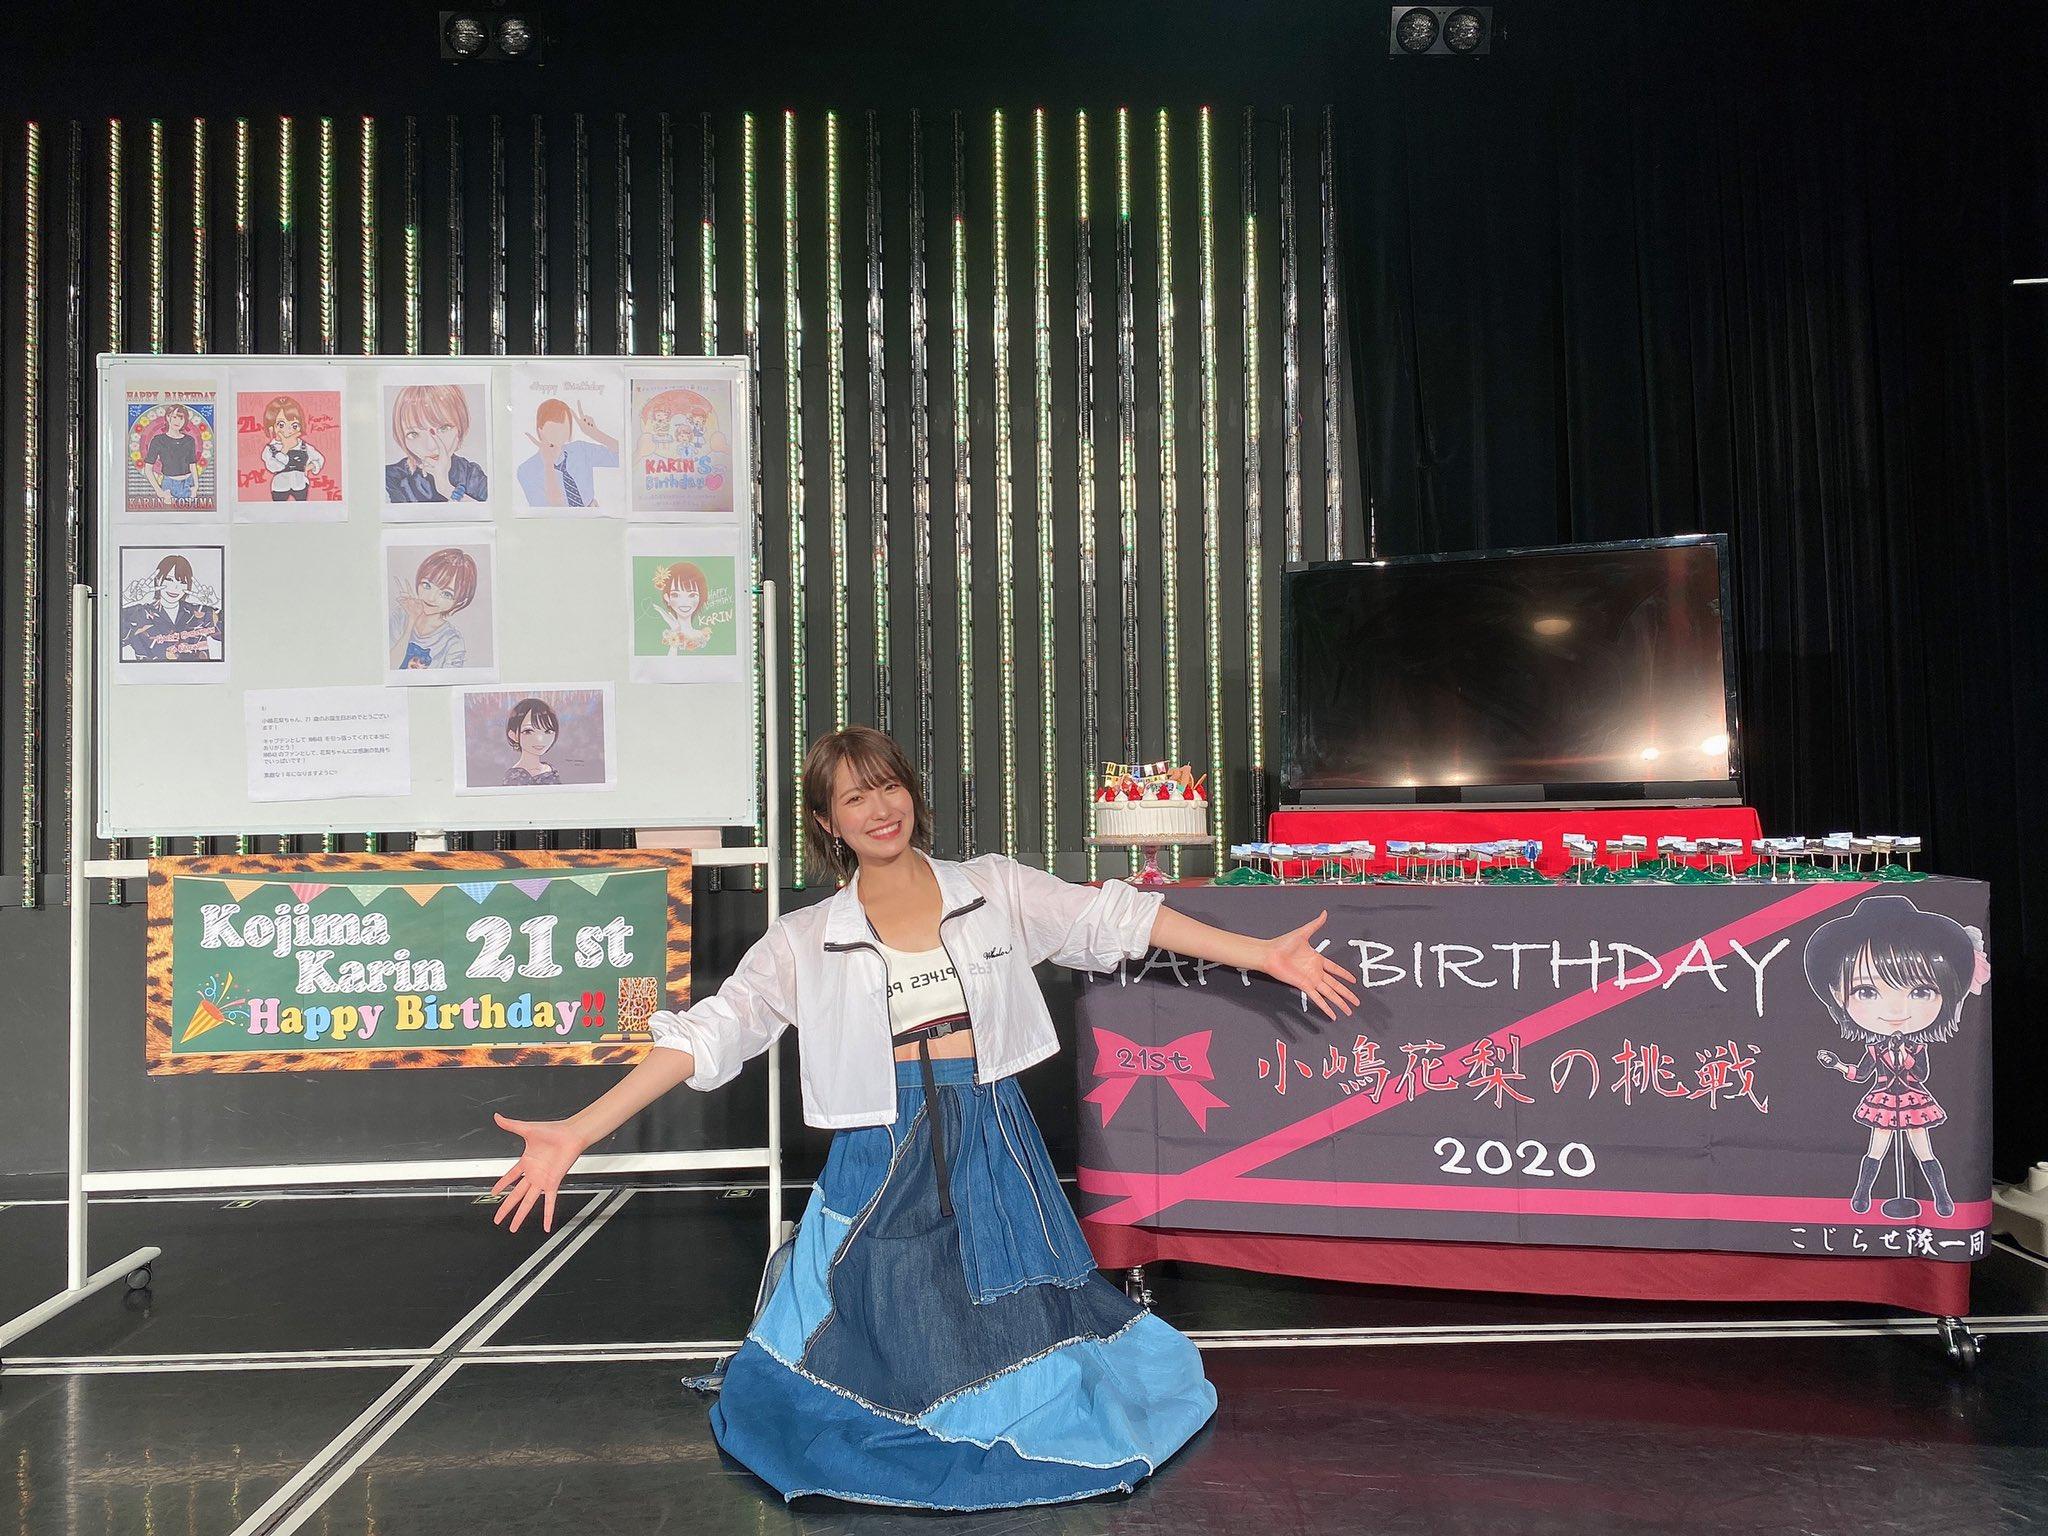 NMB48小嶋花梨「有名になる!」腹チラ衣装で決意表明【画像3枚】の画像003